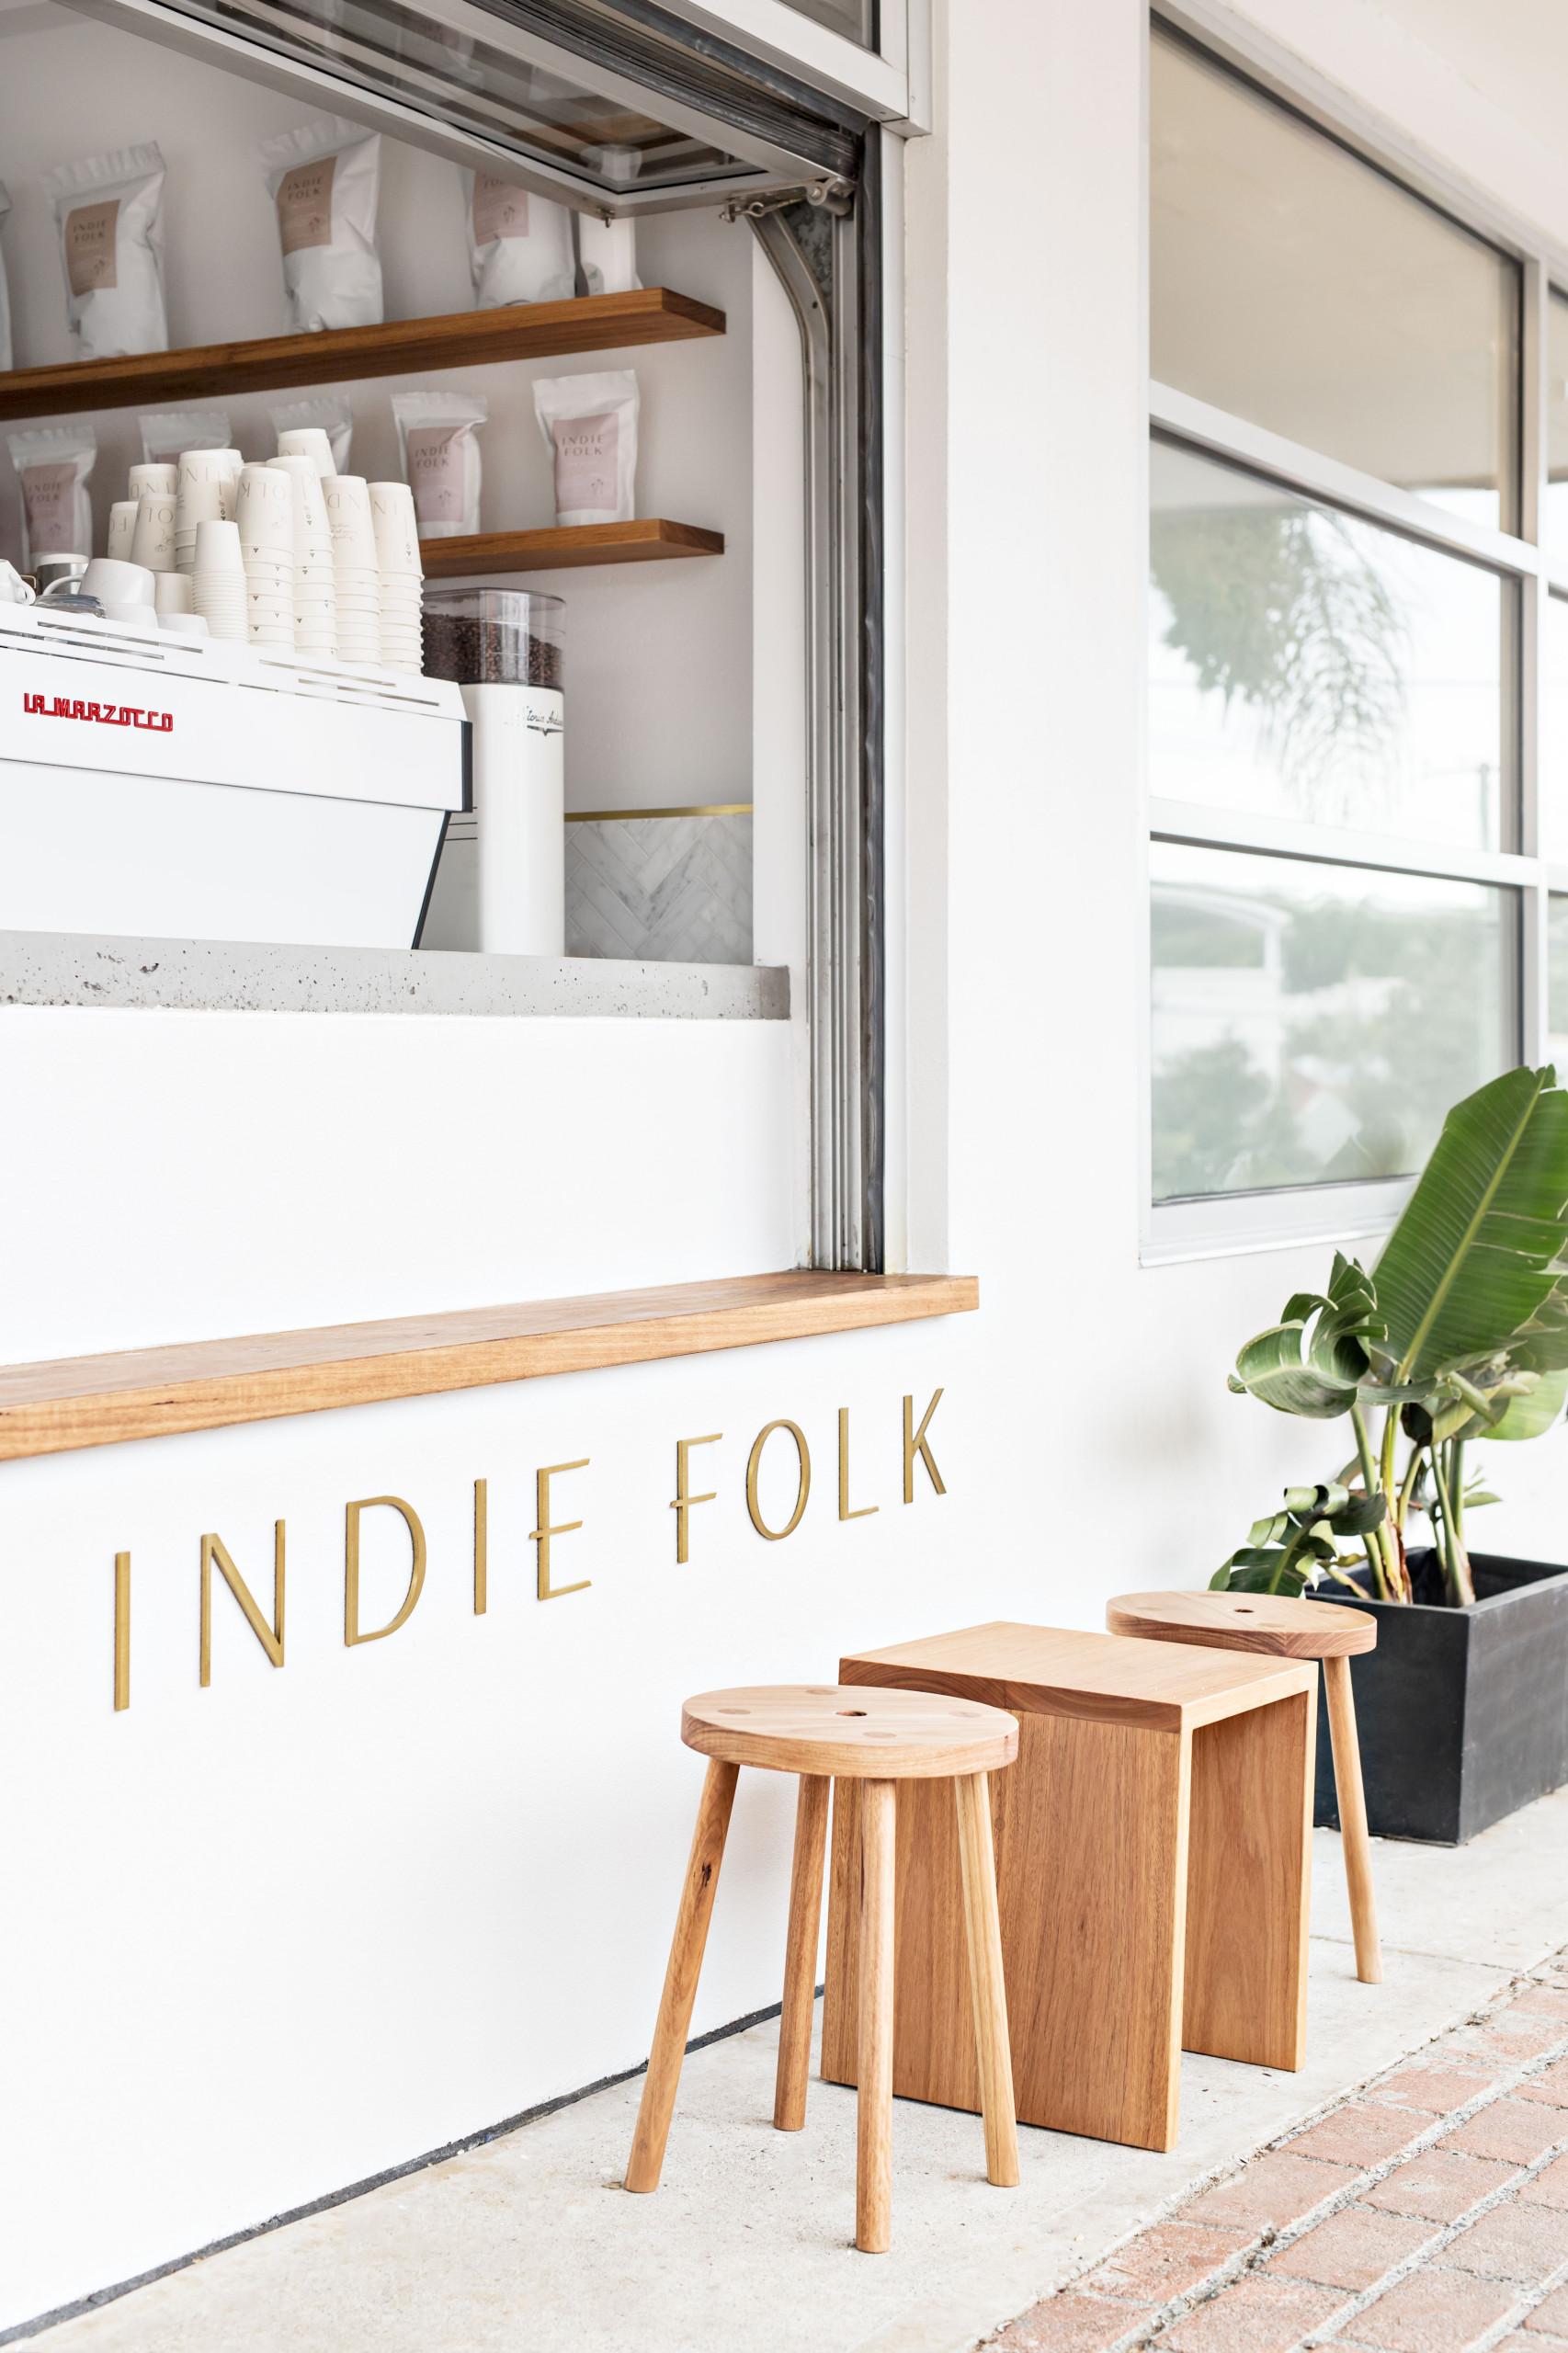 Indie Folk Cafe